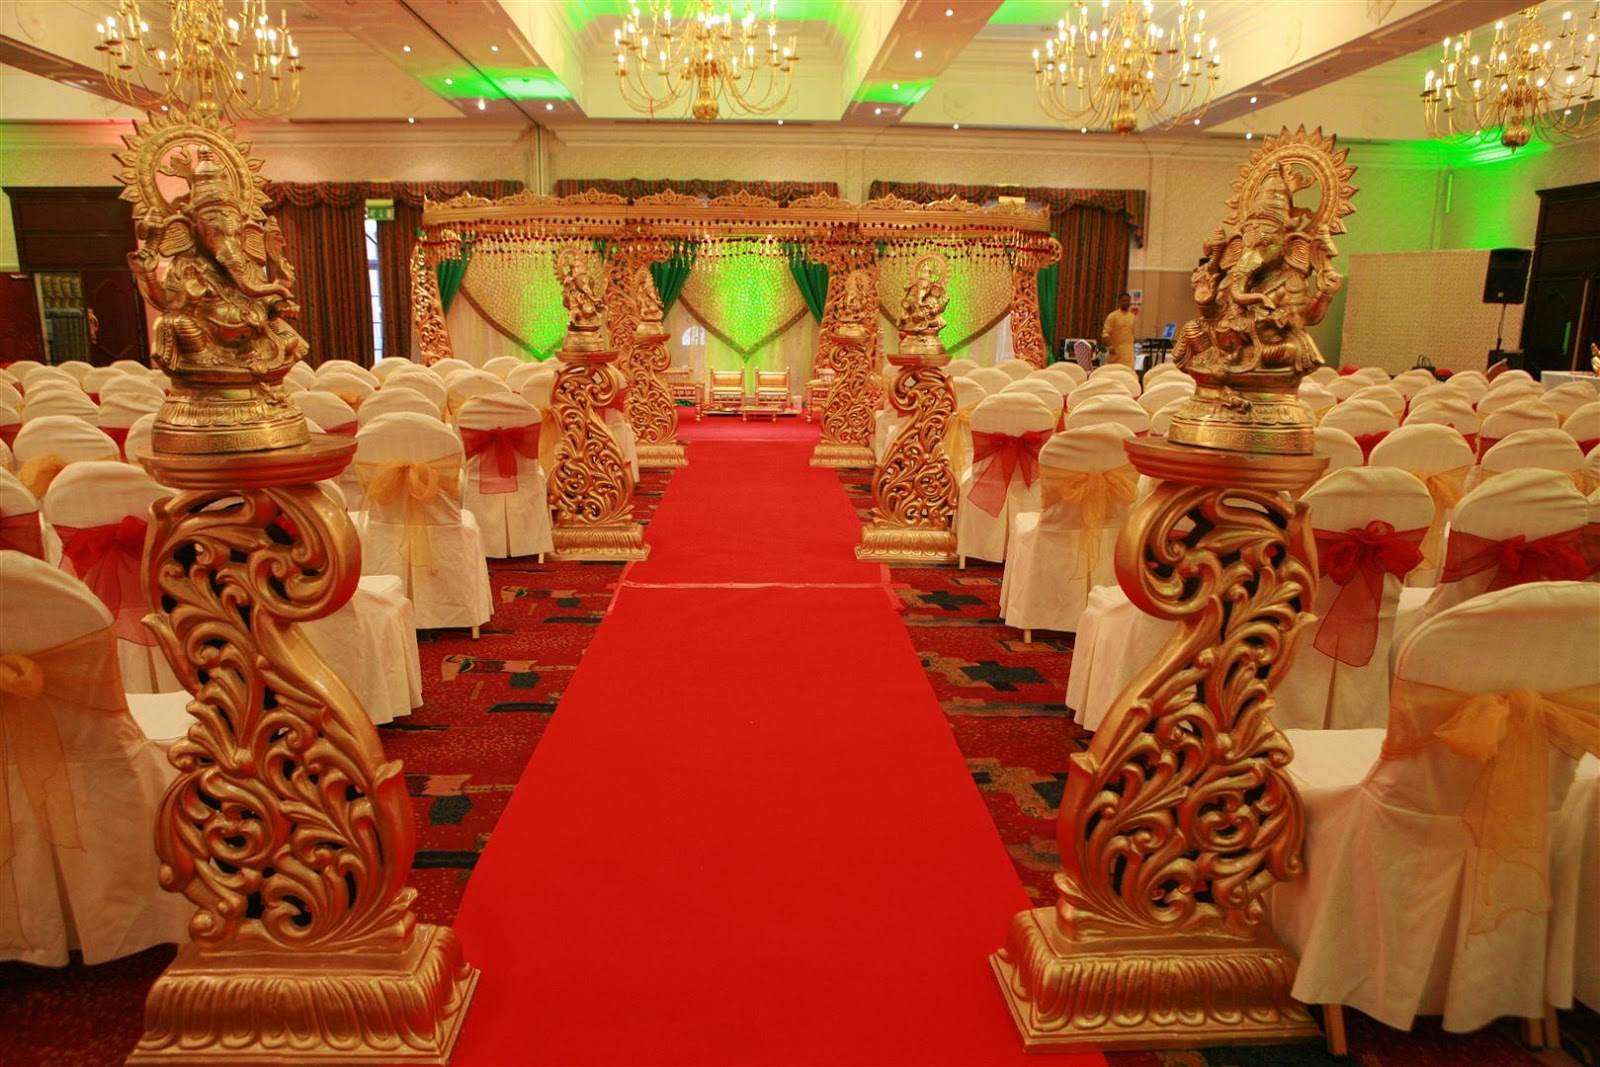 Royal Wedding Decorations